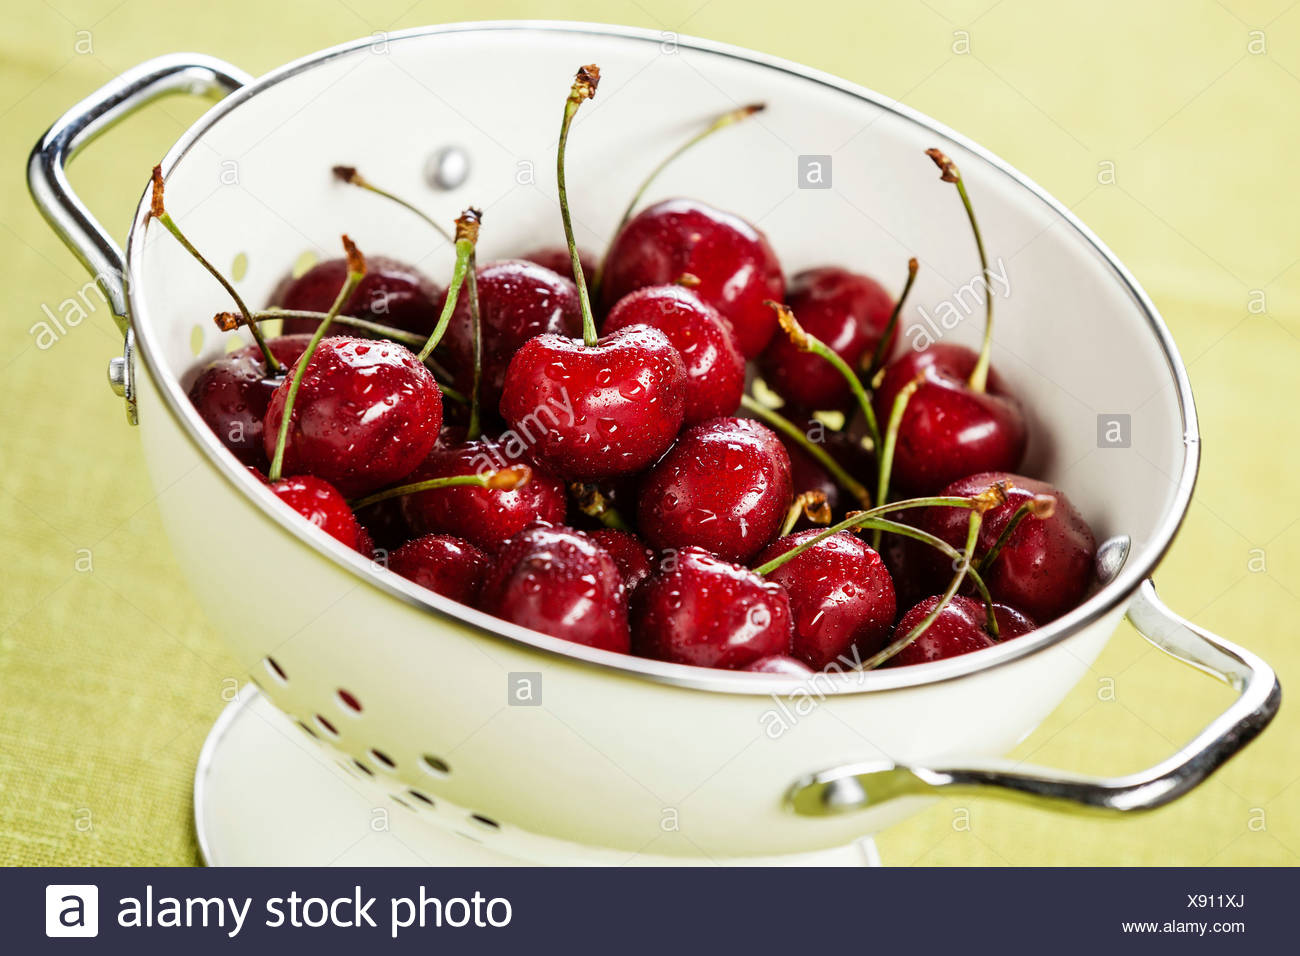 Wet ripe cherries in white colander - Stock Image